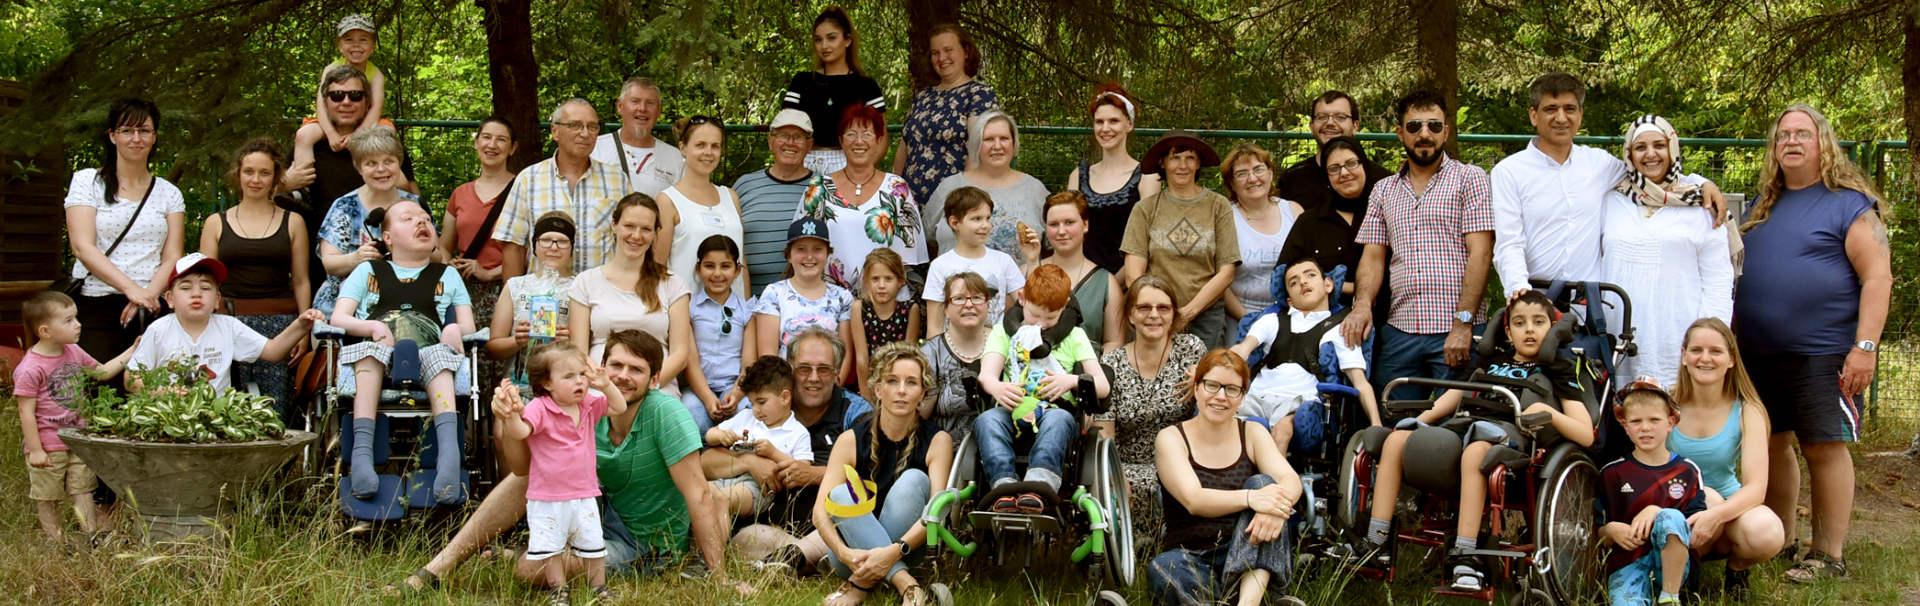 Kinderhospiz Halle Hospiz Familien